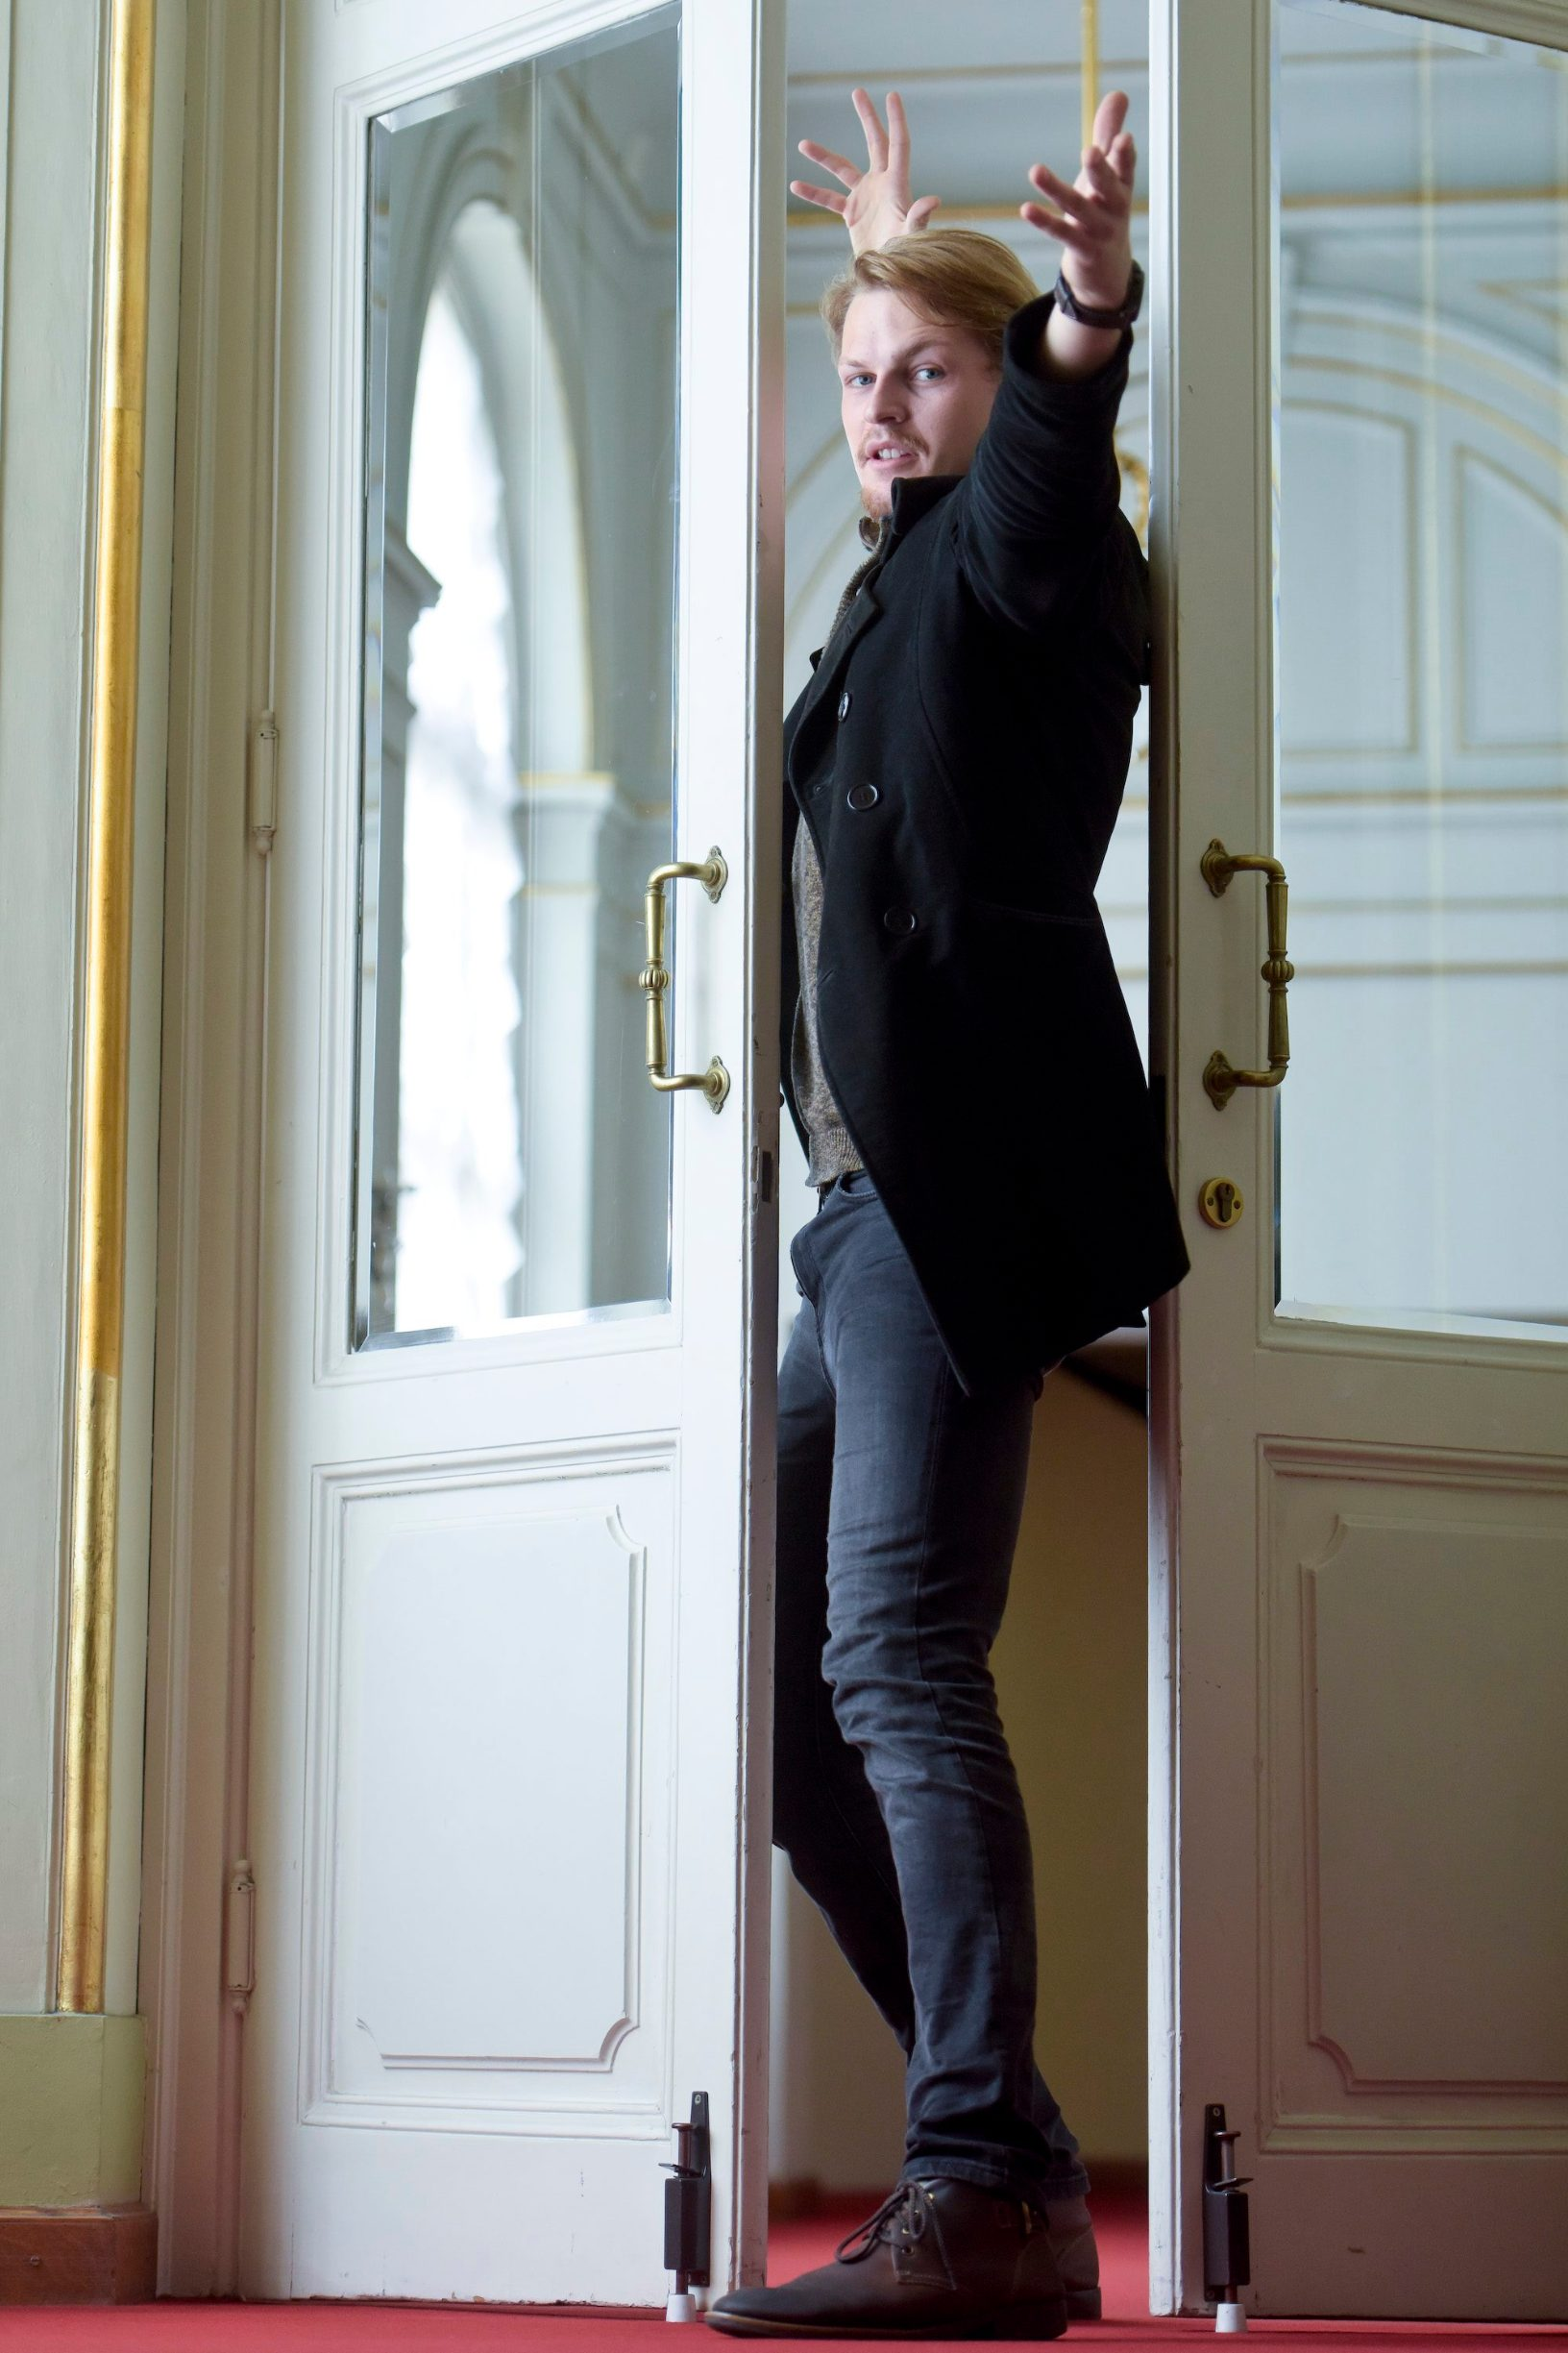 Zagreb, 101019. Trg Republike Hrvatske. Marin Kismanic, kazalisni glumac. Foto: Darko Tomas / CROPIX